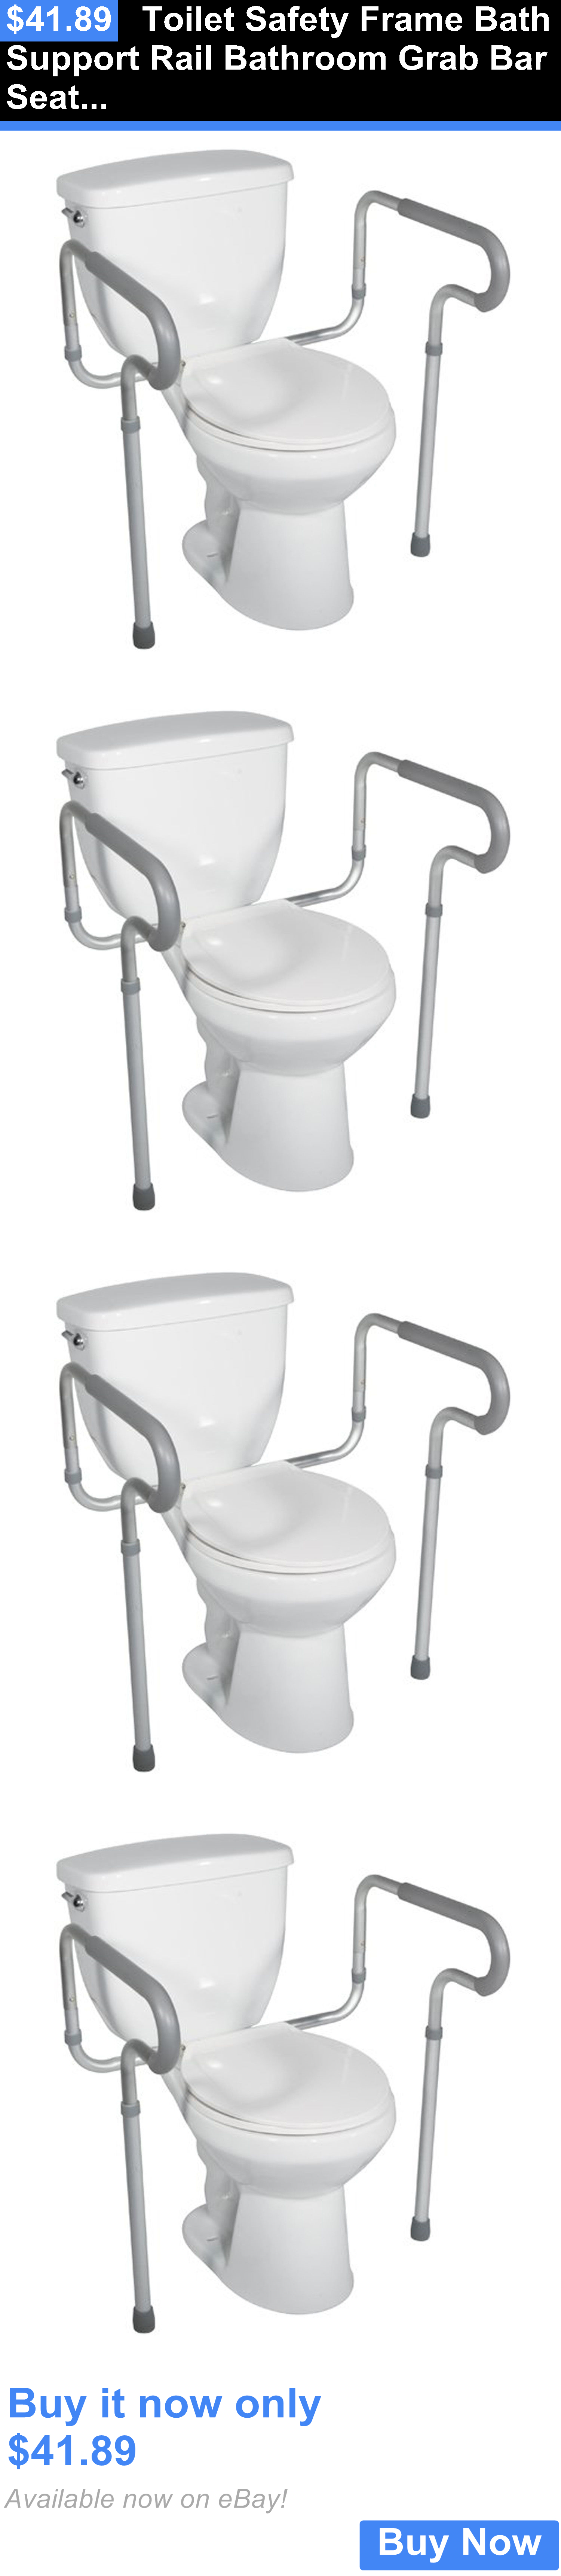 Handles and Rails: Toilet Safety Frame Bath Support Rail Bathroom ...